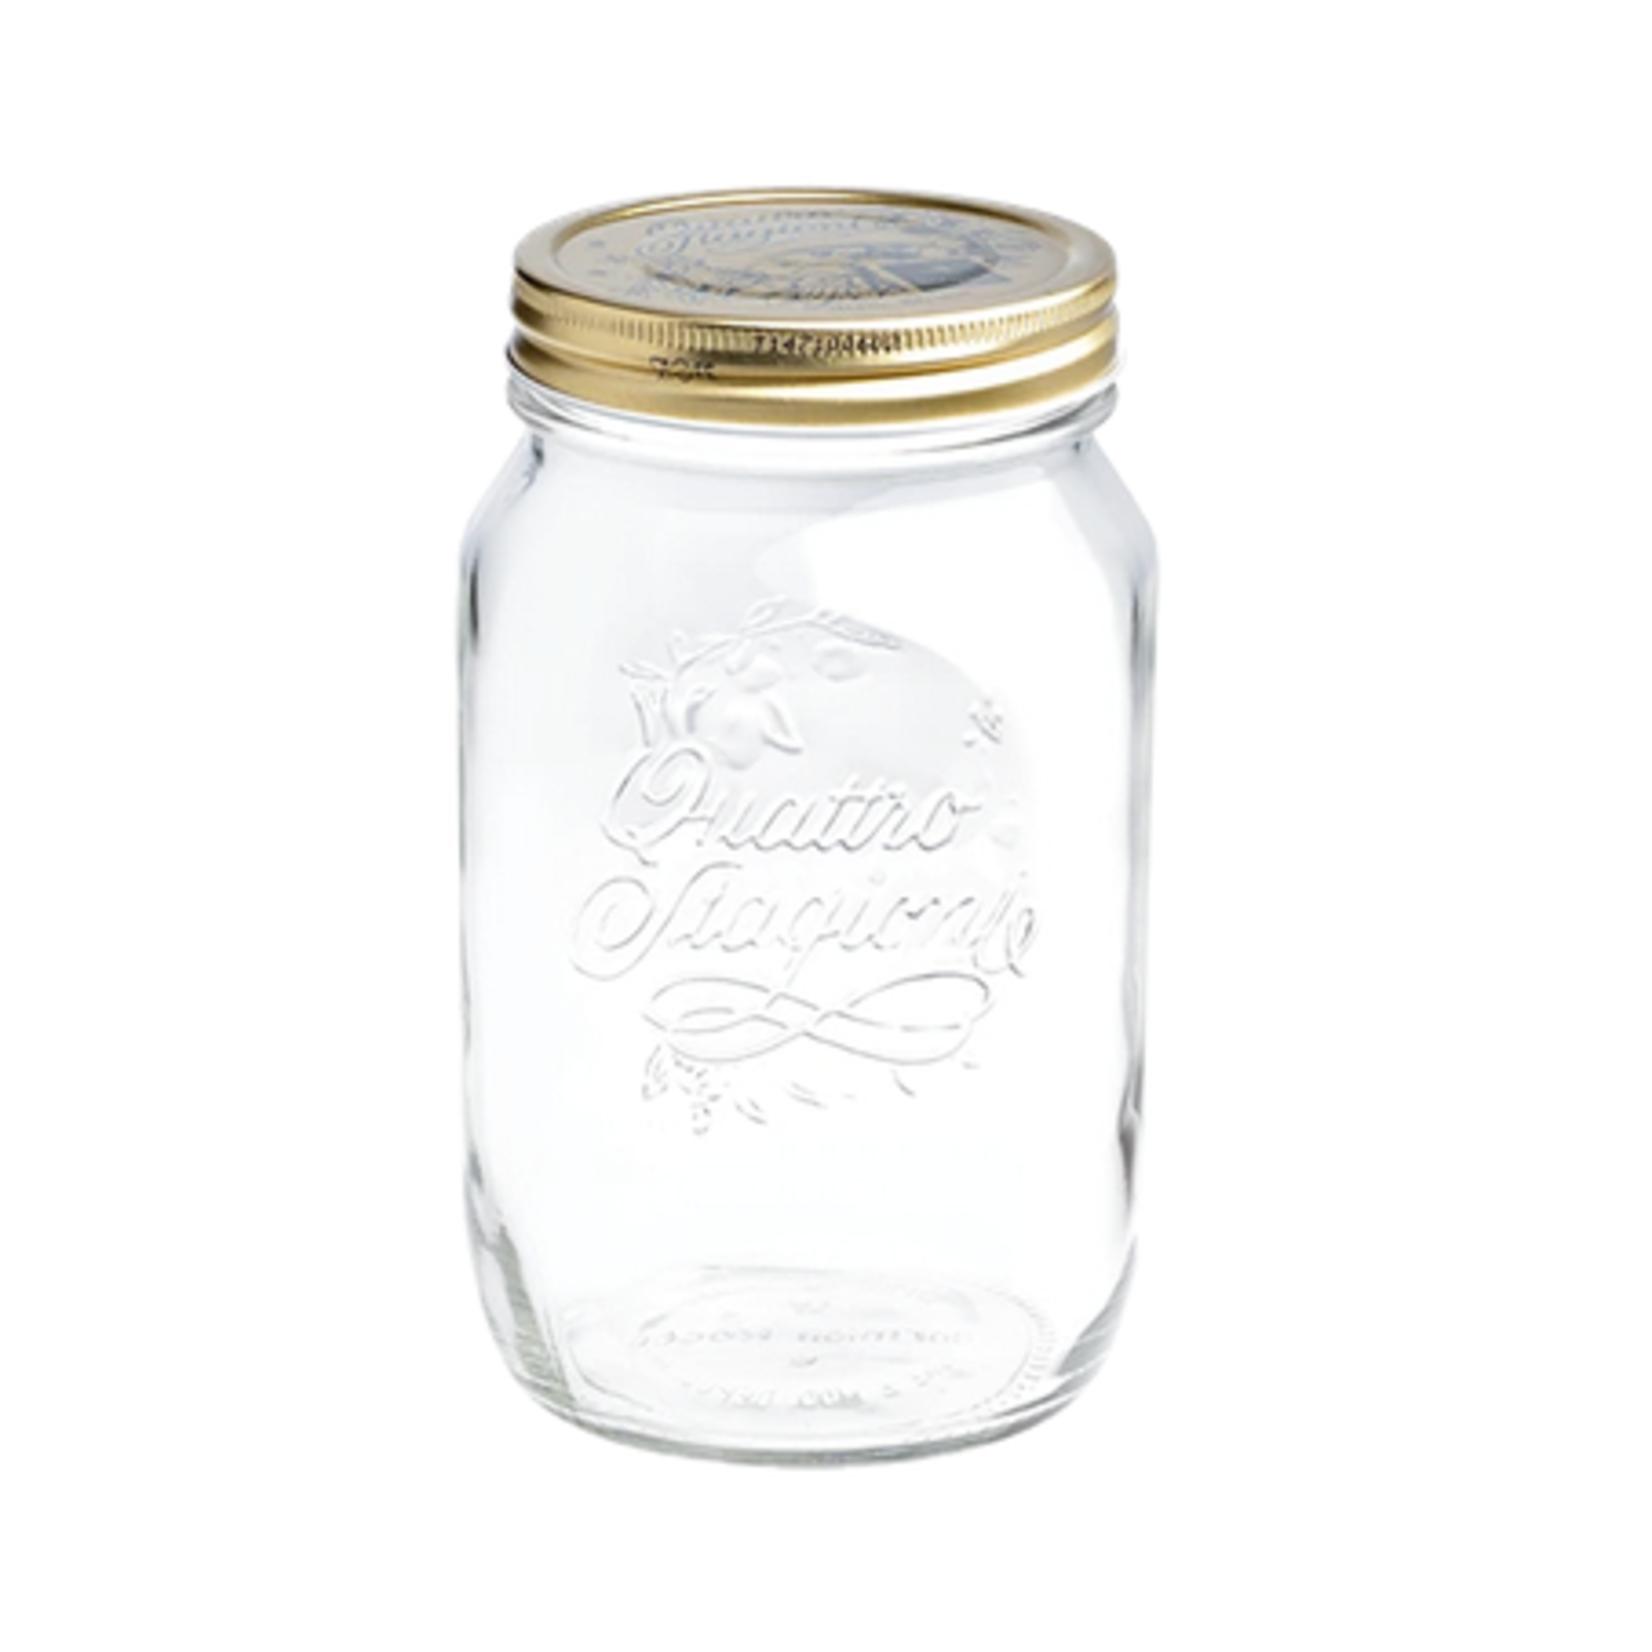 Quattro Stagioni Glass Canning Jar, 33.75 oz.